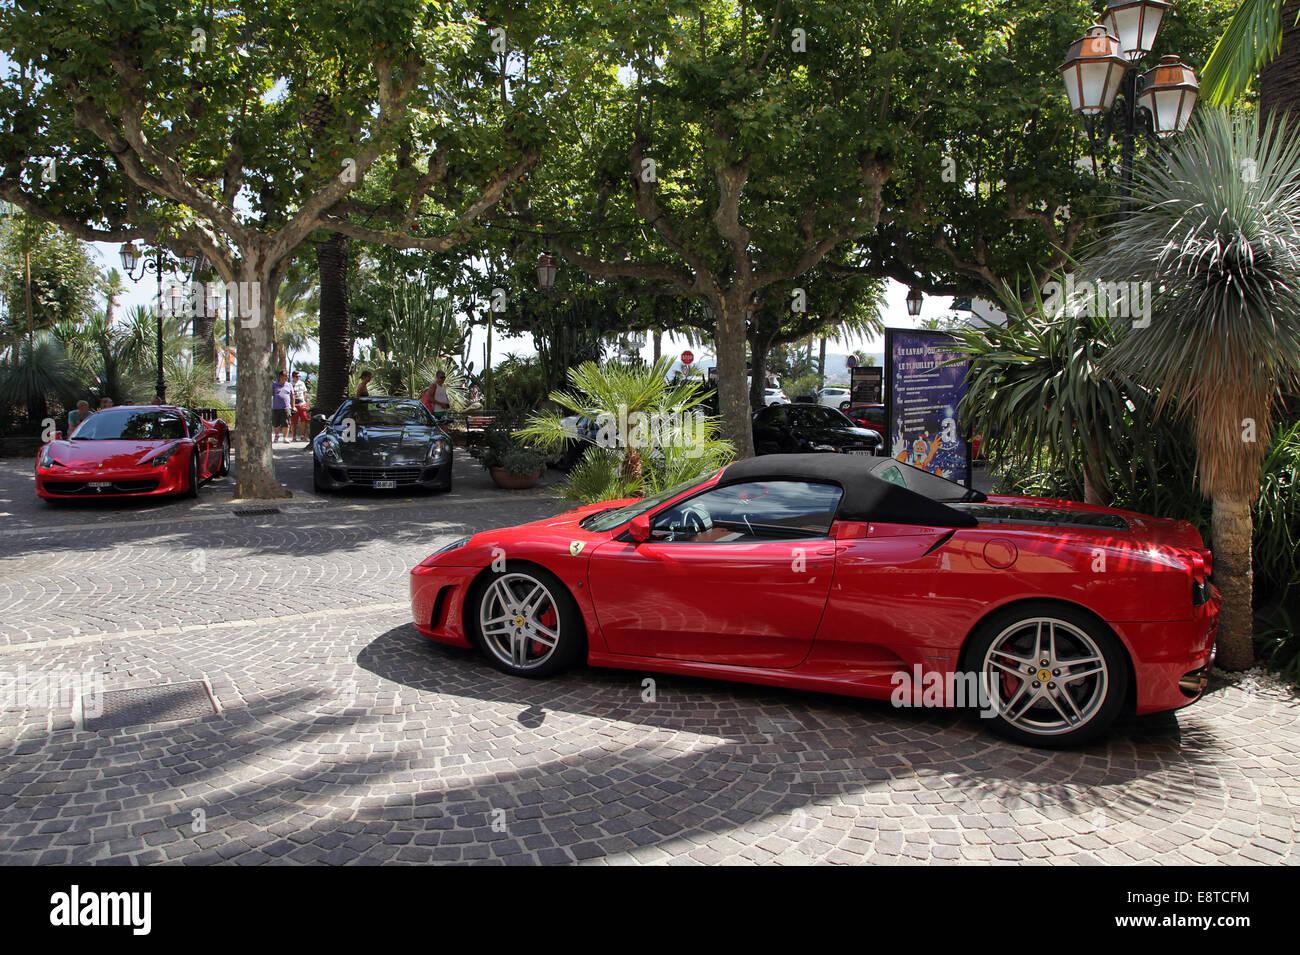 Sports car.Ferrari F430 spider convertible - Stock Image